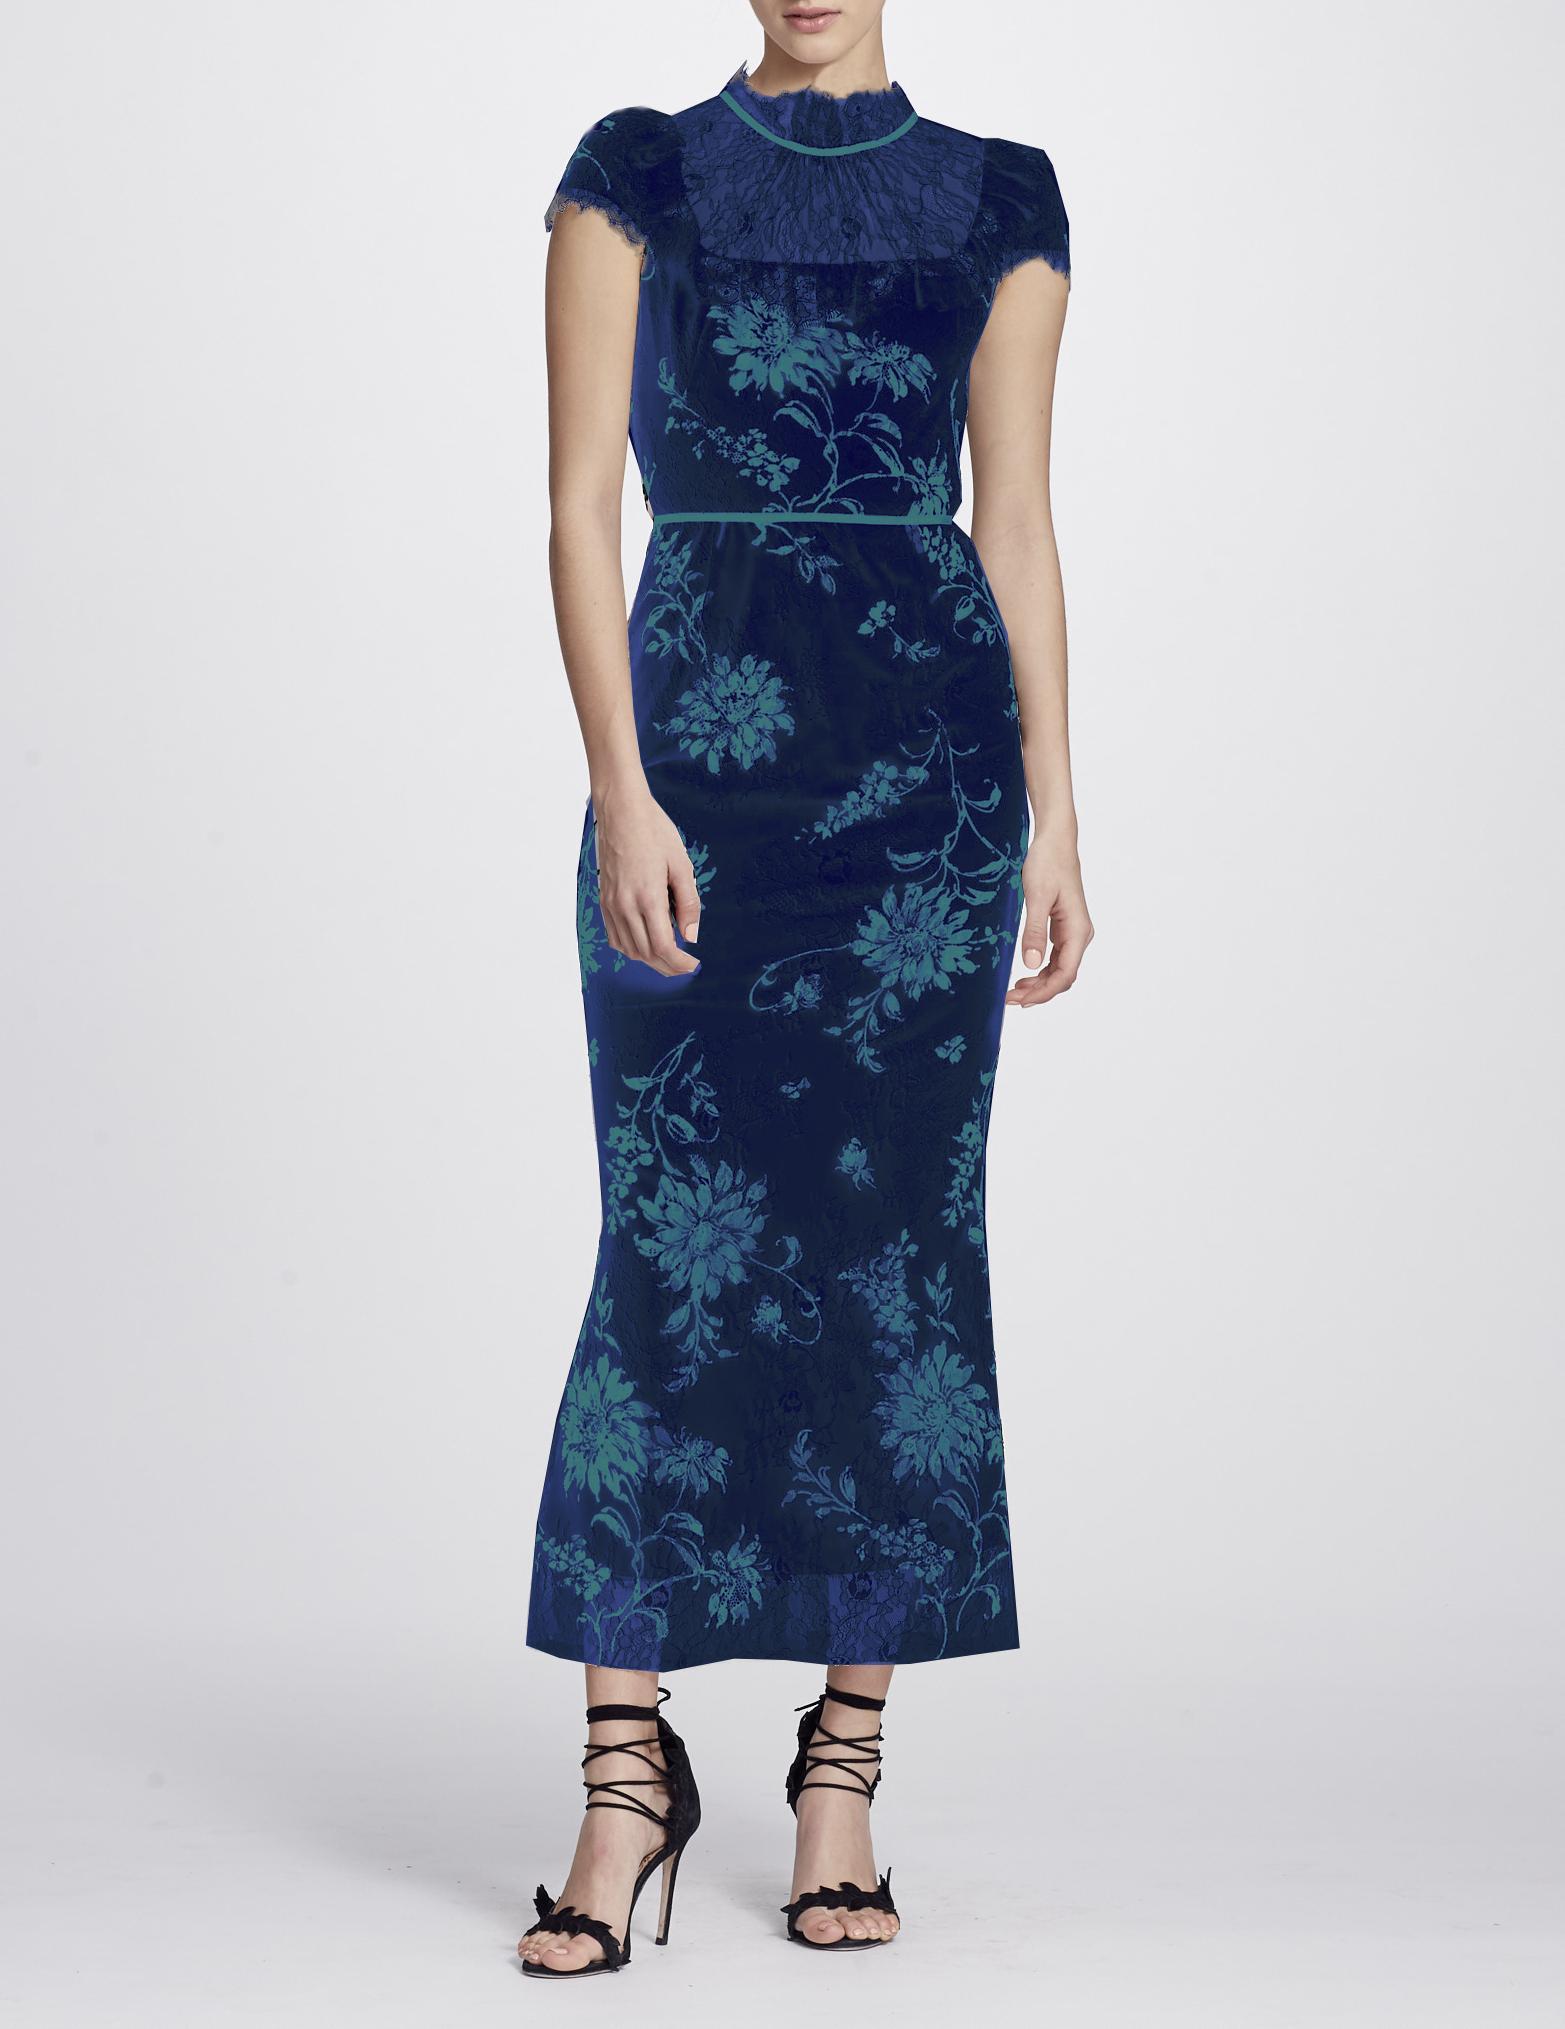 Marchesa Notte Cap Sleeve Floral Midi Tea Dress In Navy Blue